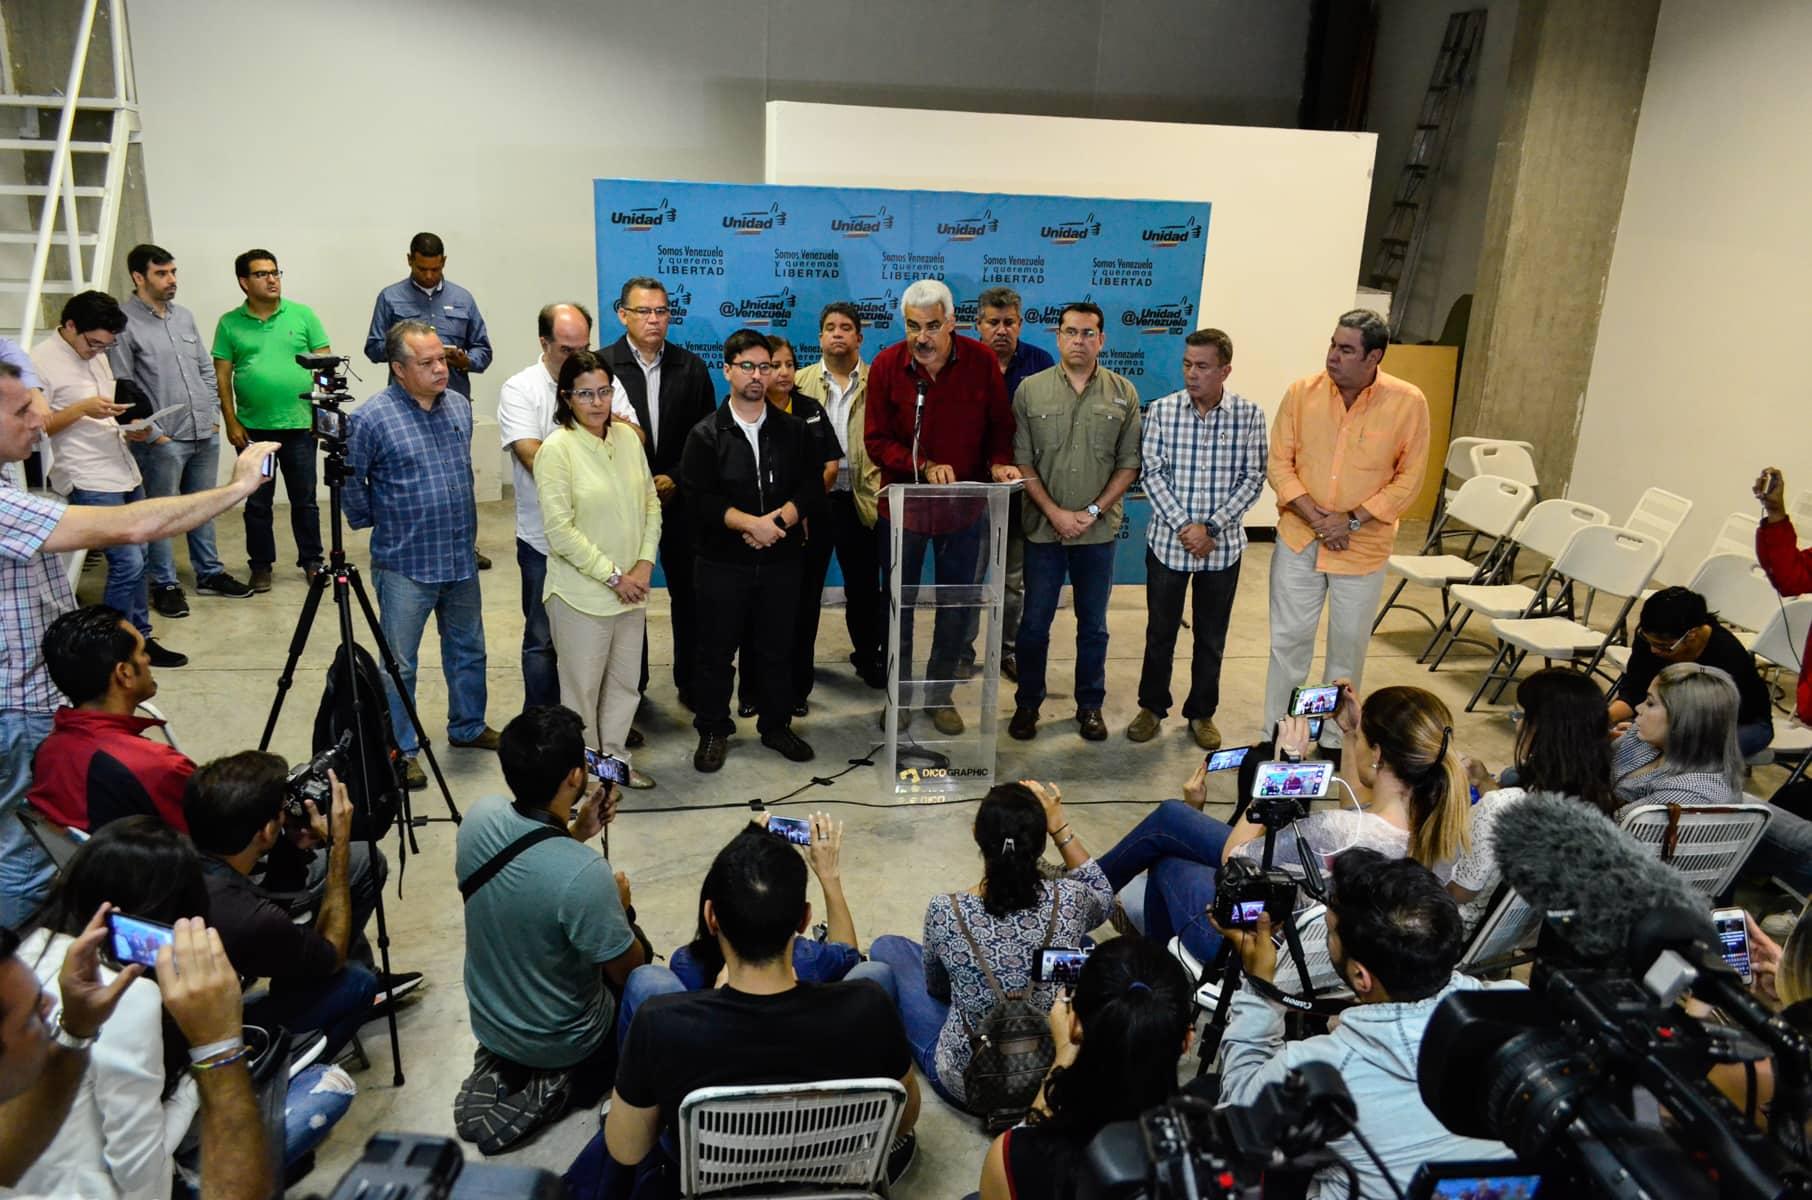 Angel Oropeza, Liliana Hernandez, Freddy Guevara, Gerardo Blyde